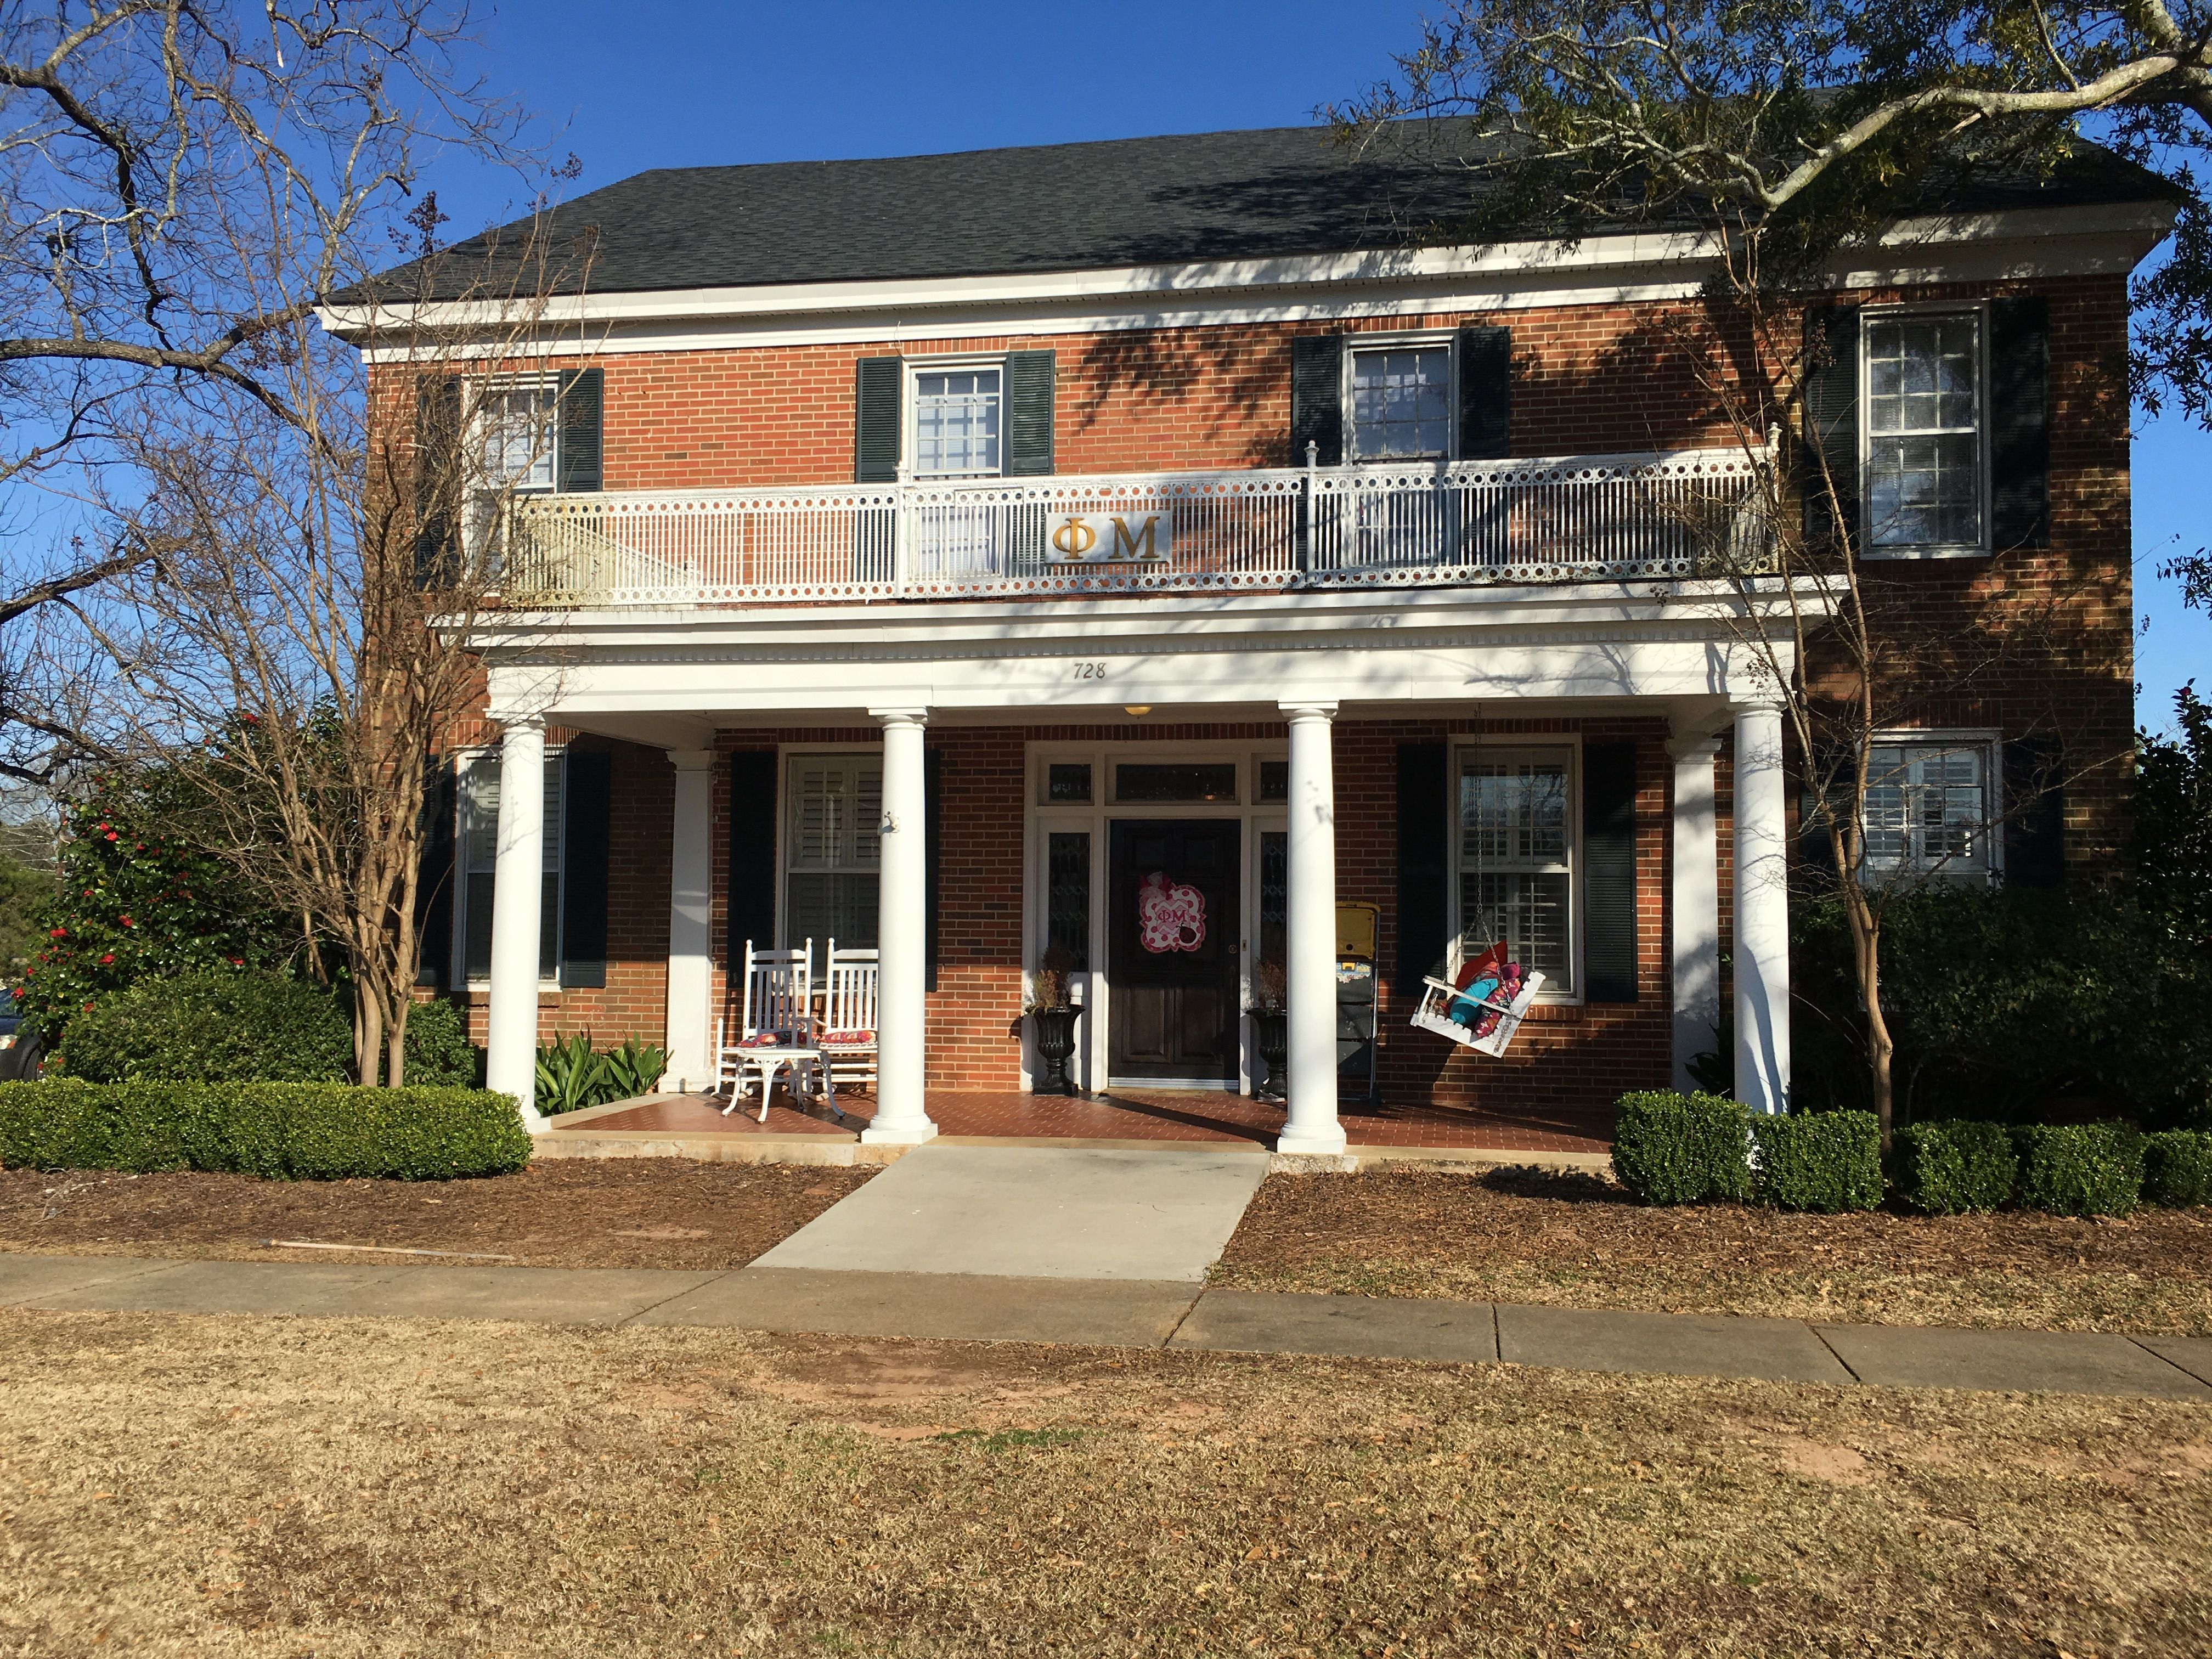 Usc Gamma Phi Beta Sorority House University Of South Carolina